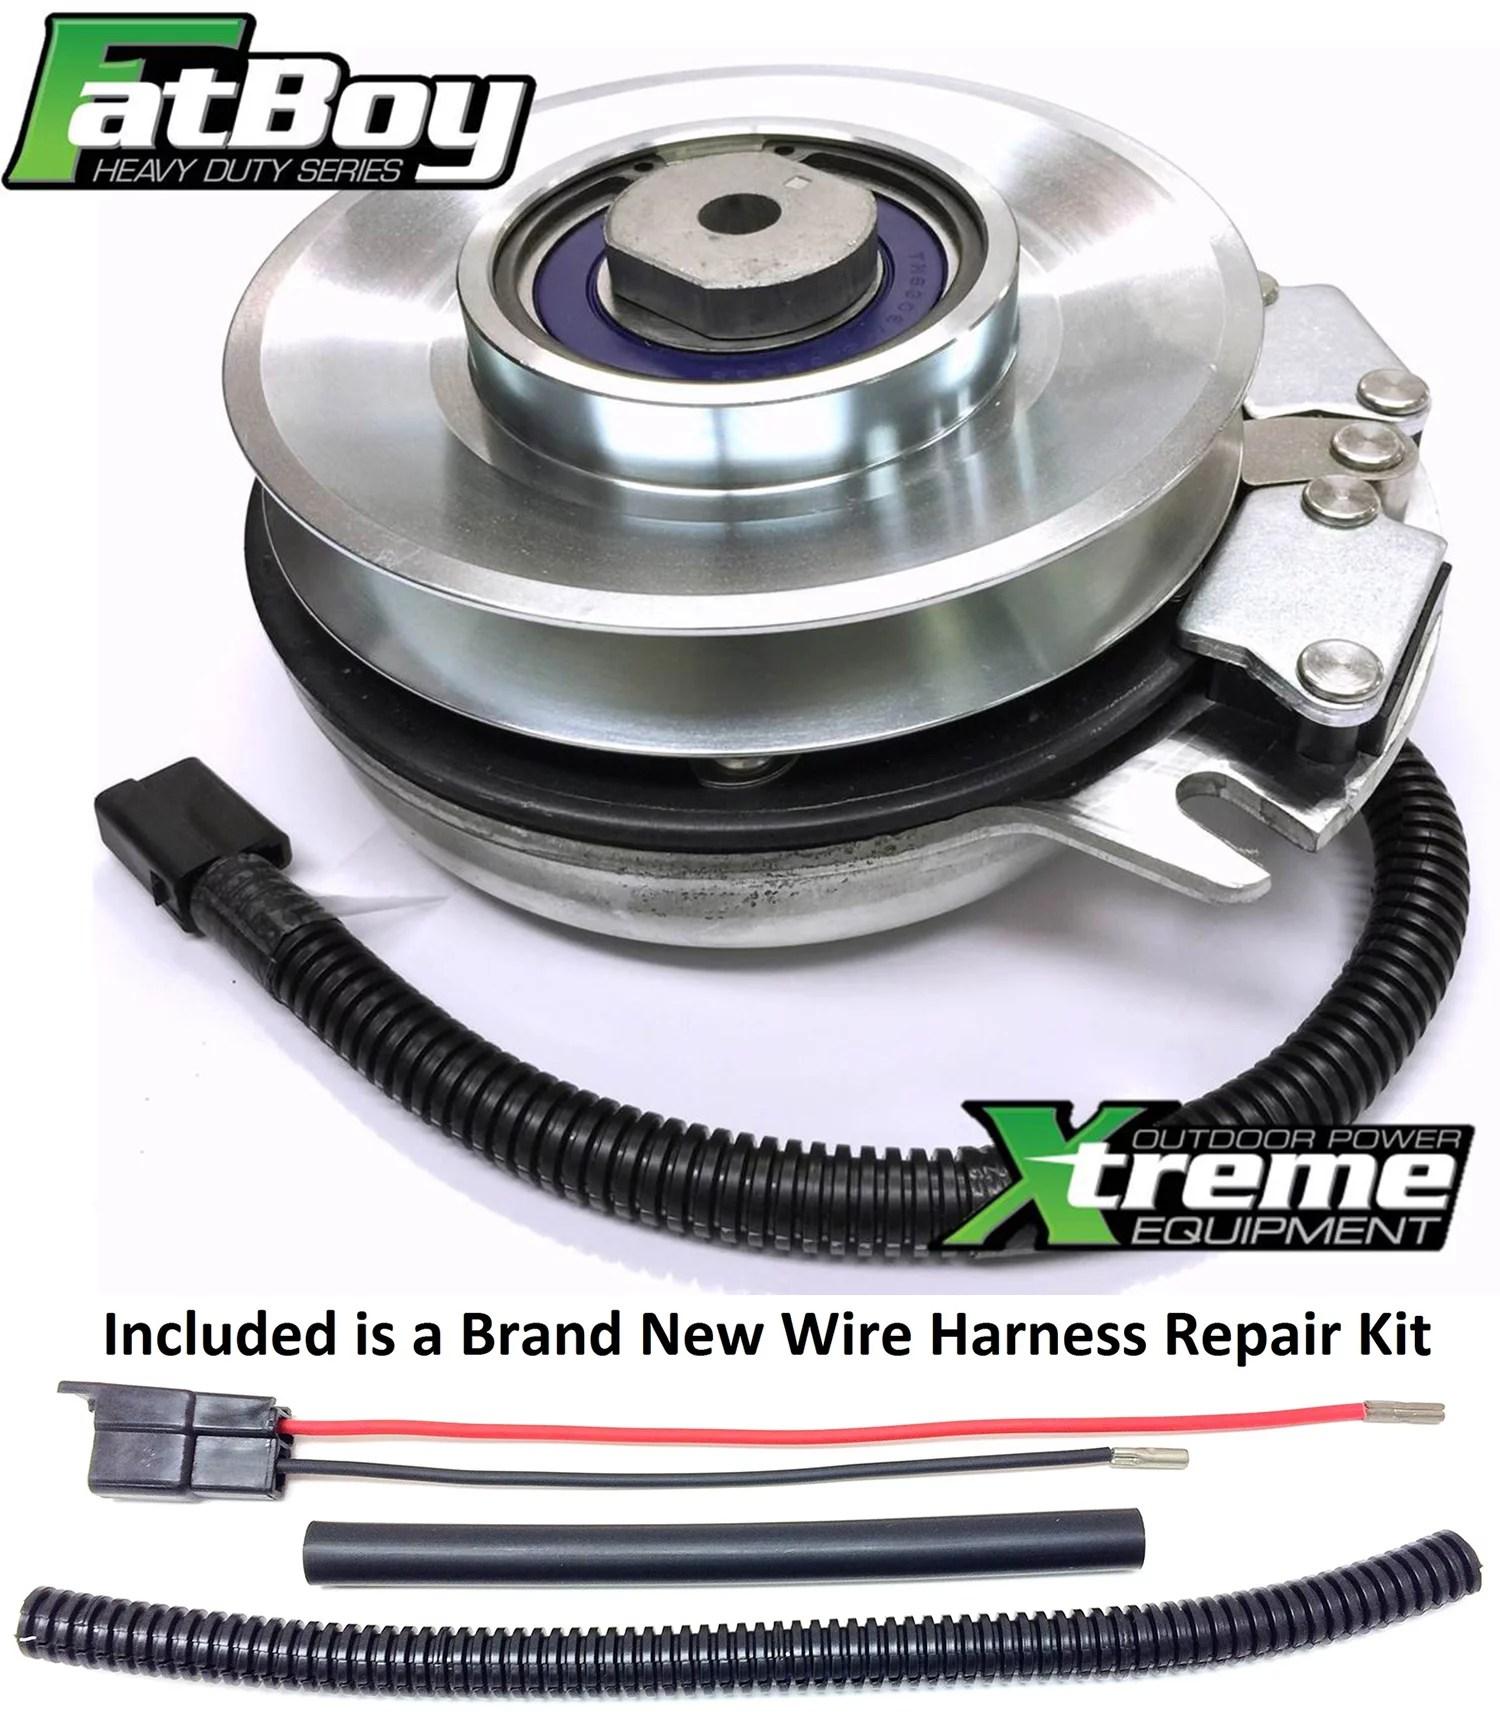 medium resolution of bundle 2 items pto electric blade clutch wire harness repair kitbundle 2 items pto electric blade clutch wire harness repair kit replaces bush hog